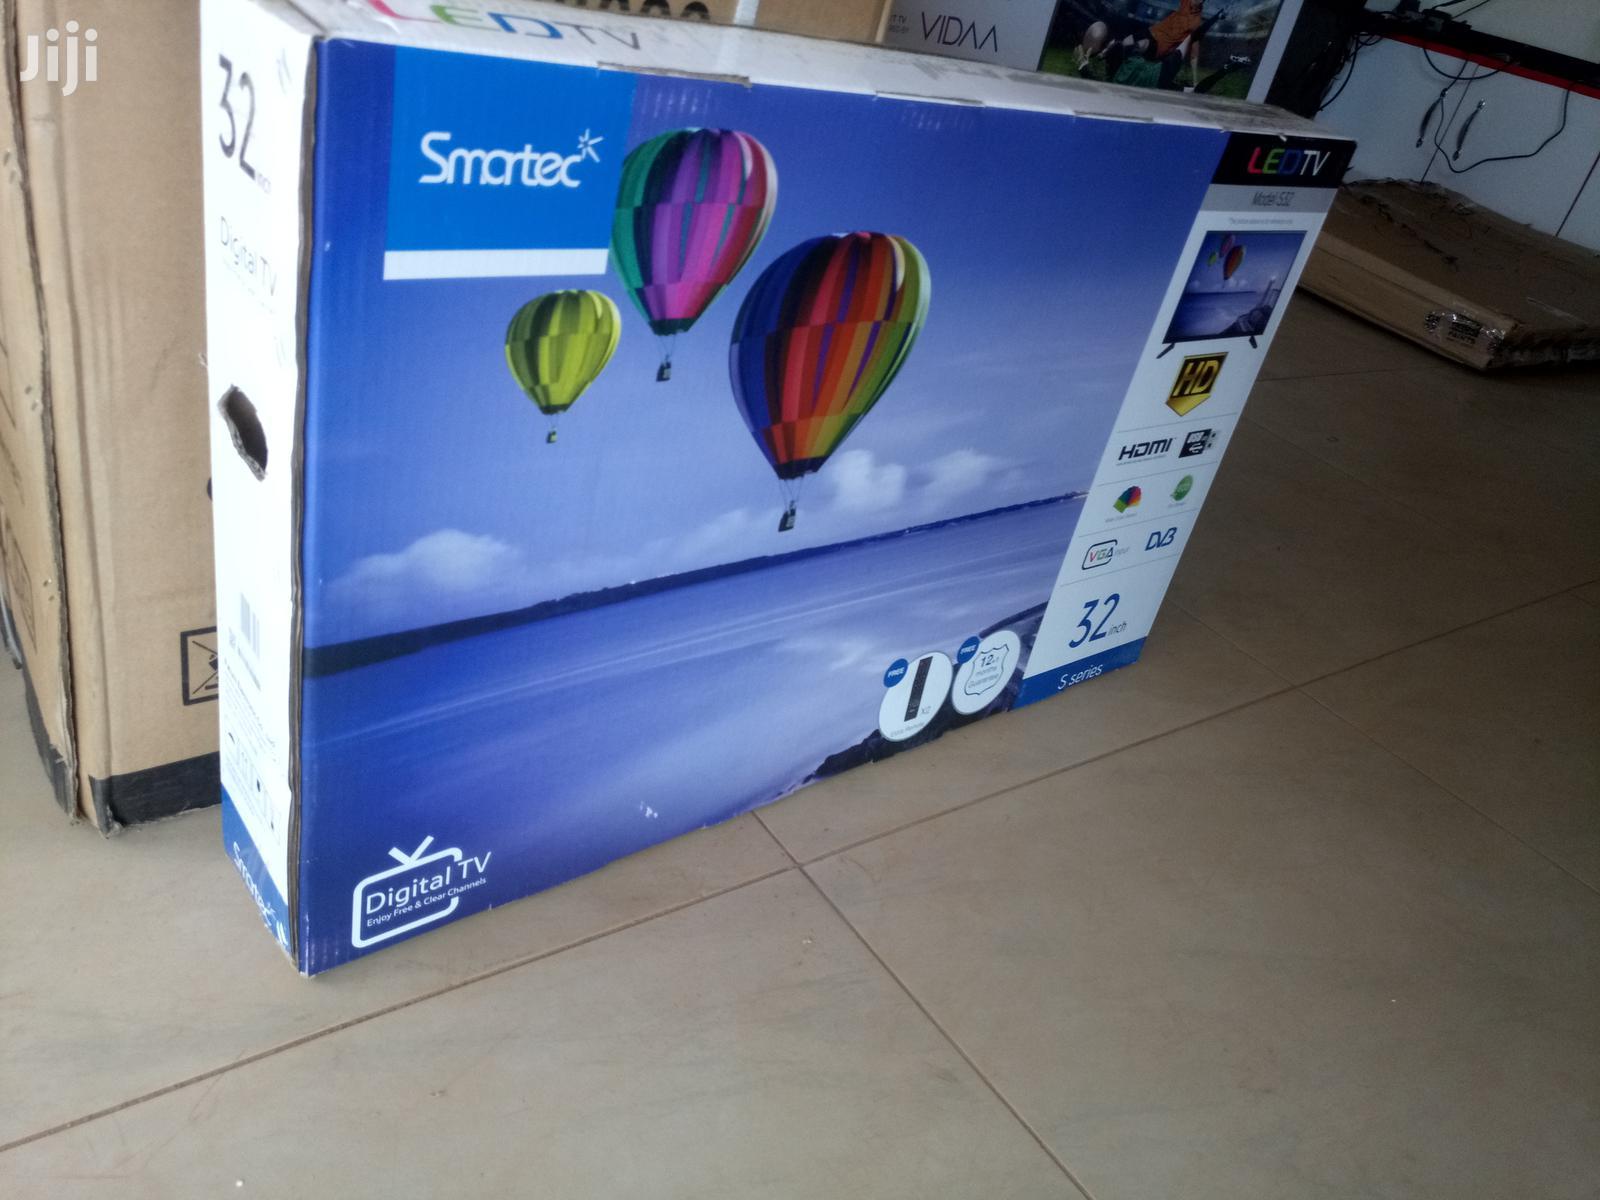 Archive: New Smartec Flat Screen Digital TV 32 Inches